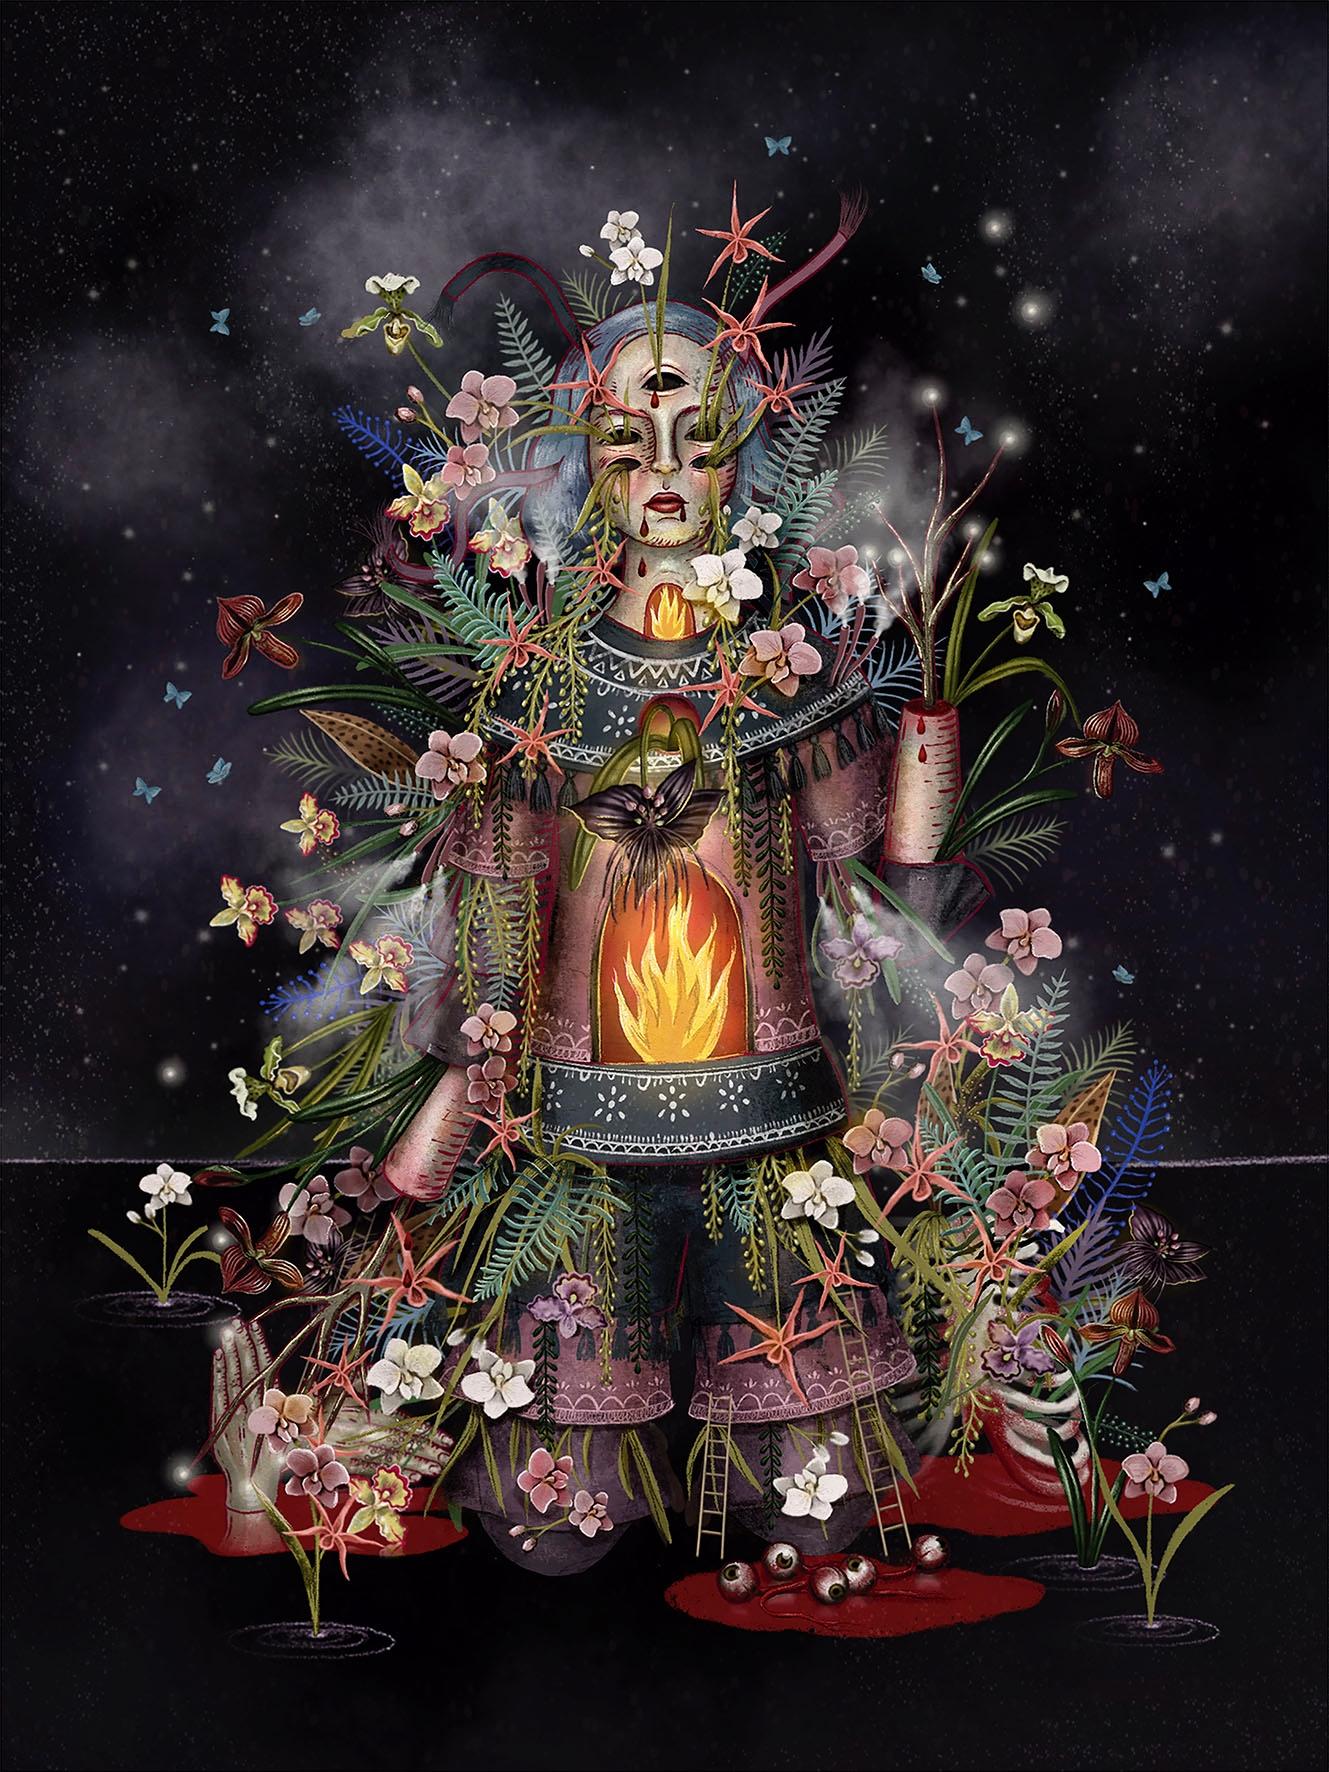 Orchid Garden Digital Art Ale D - aledelatorre | ello